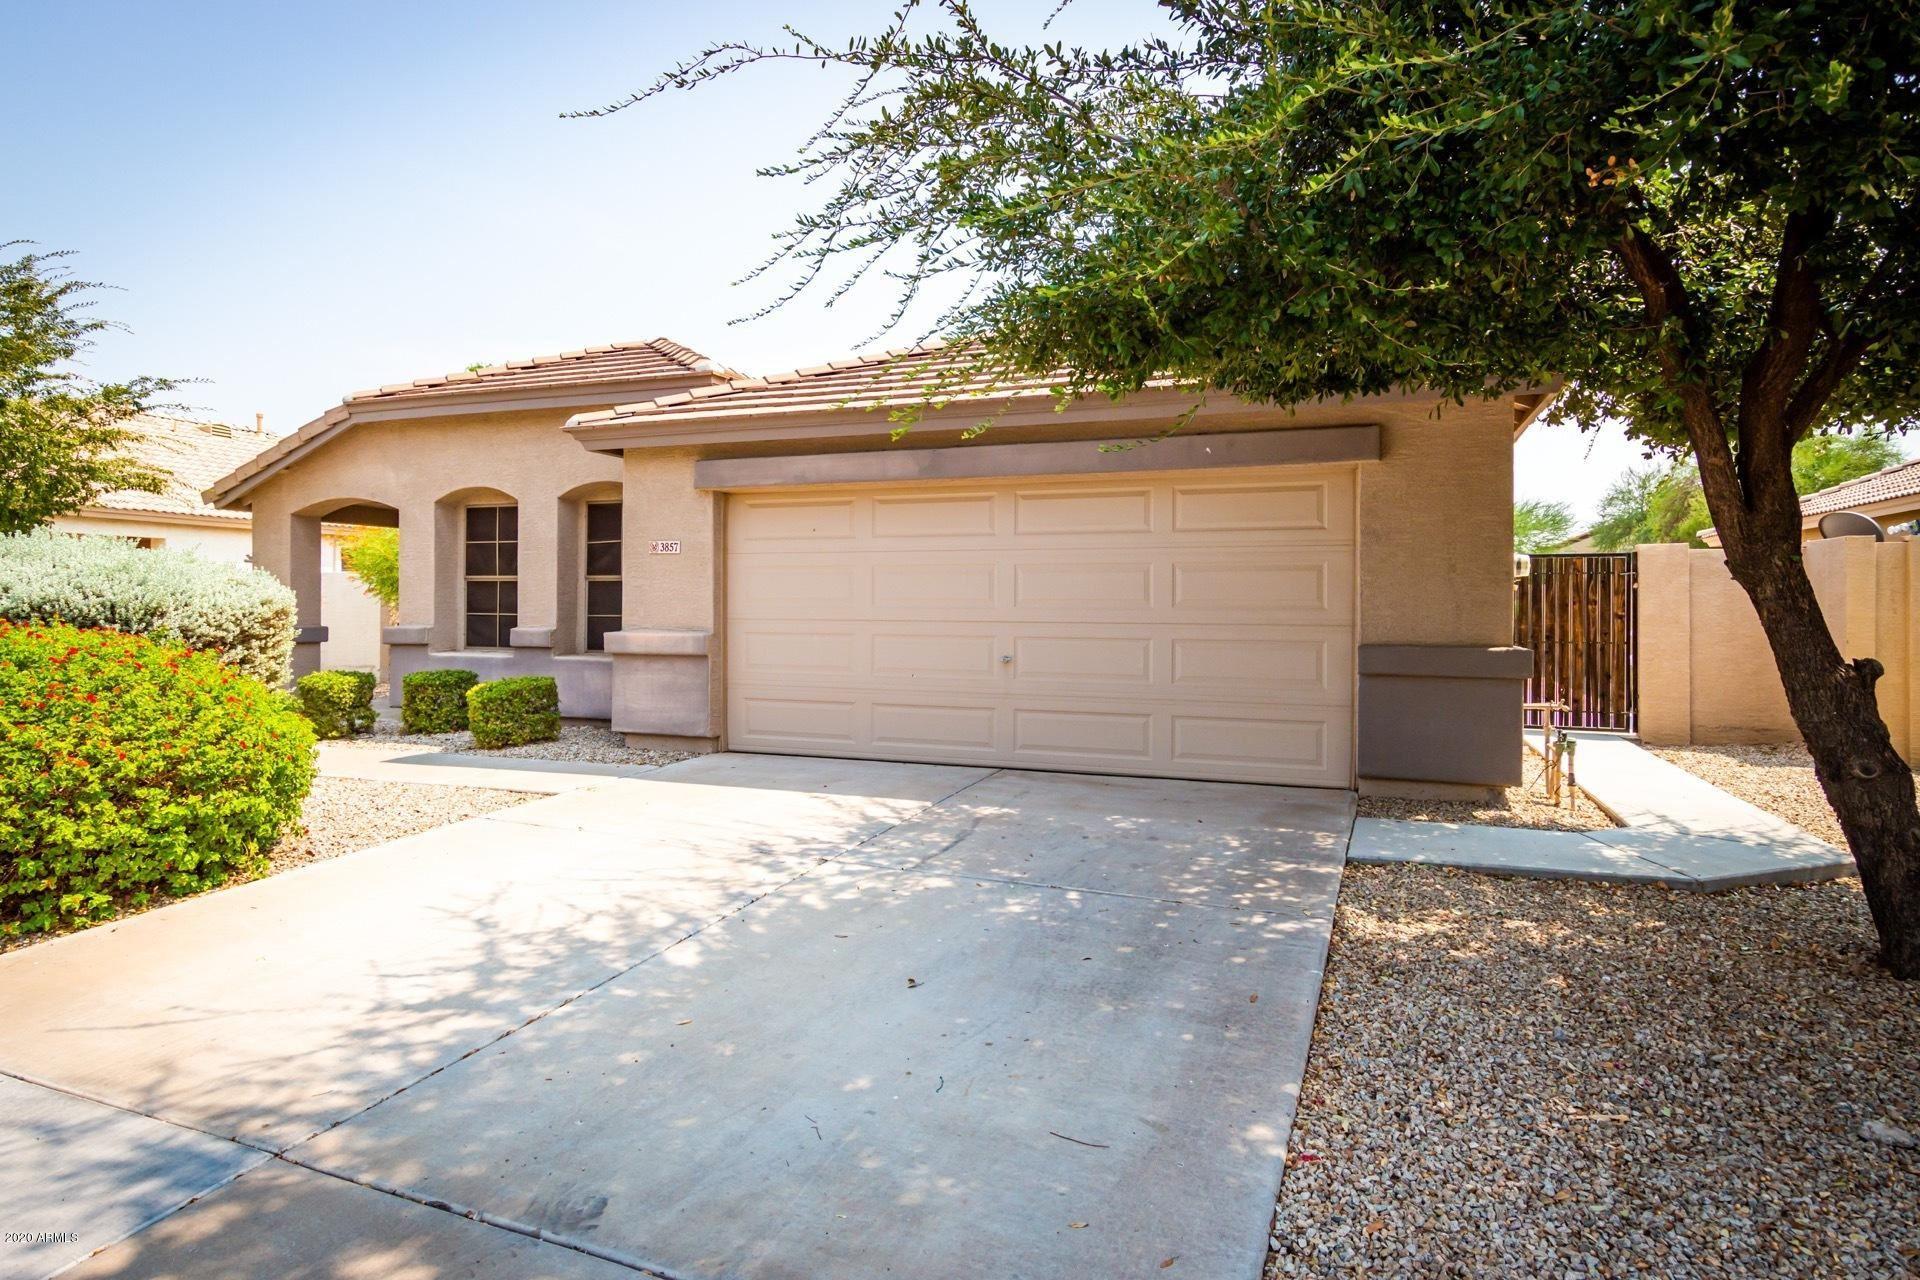 3857 S SOHO Lane, Chandler, AZ 85286 - MLS#: 6123301